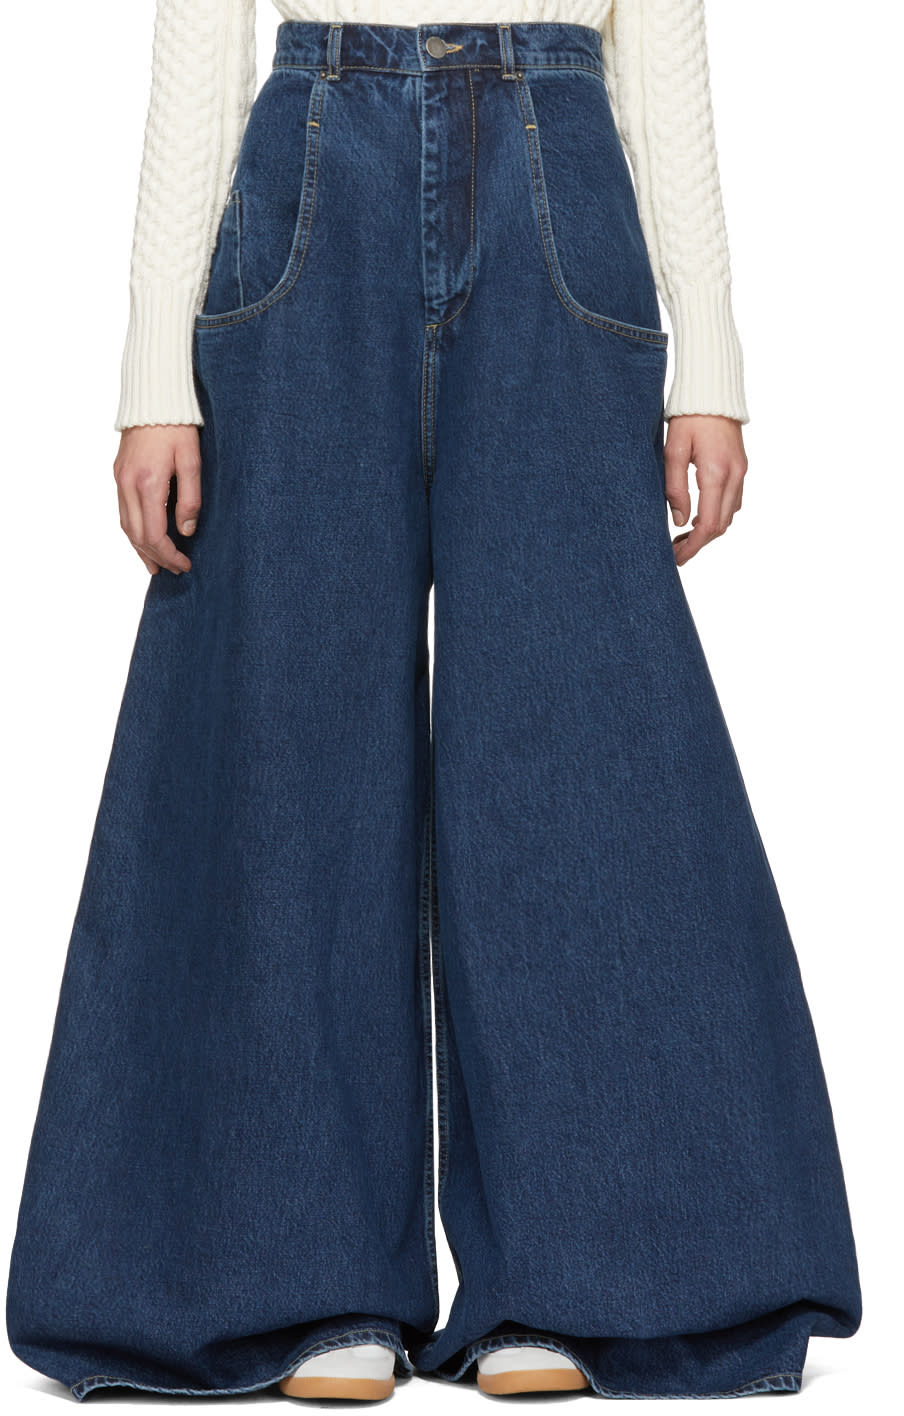 Image of Martine Rose Indigo Wide-leg Rave Jeans